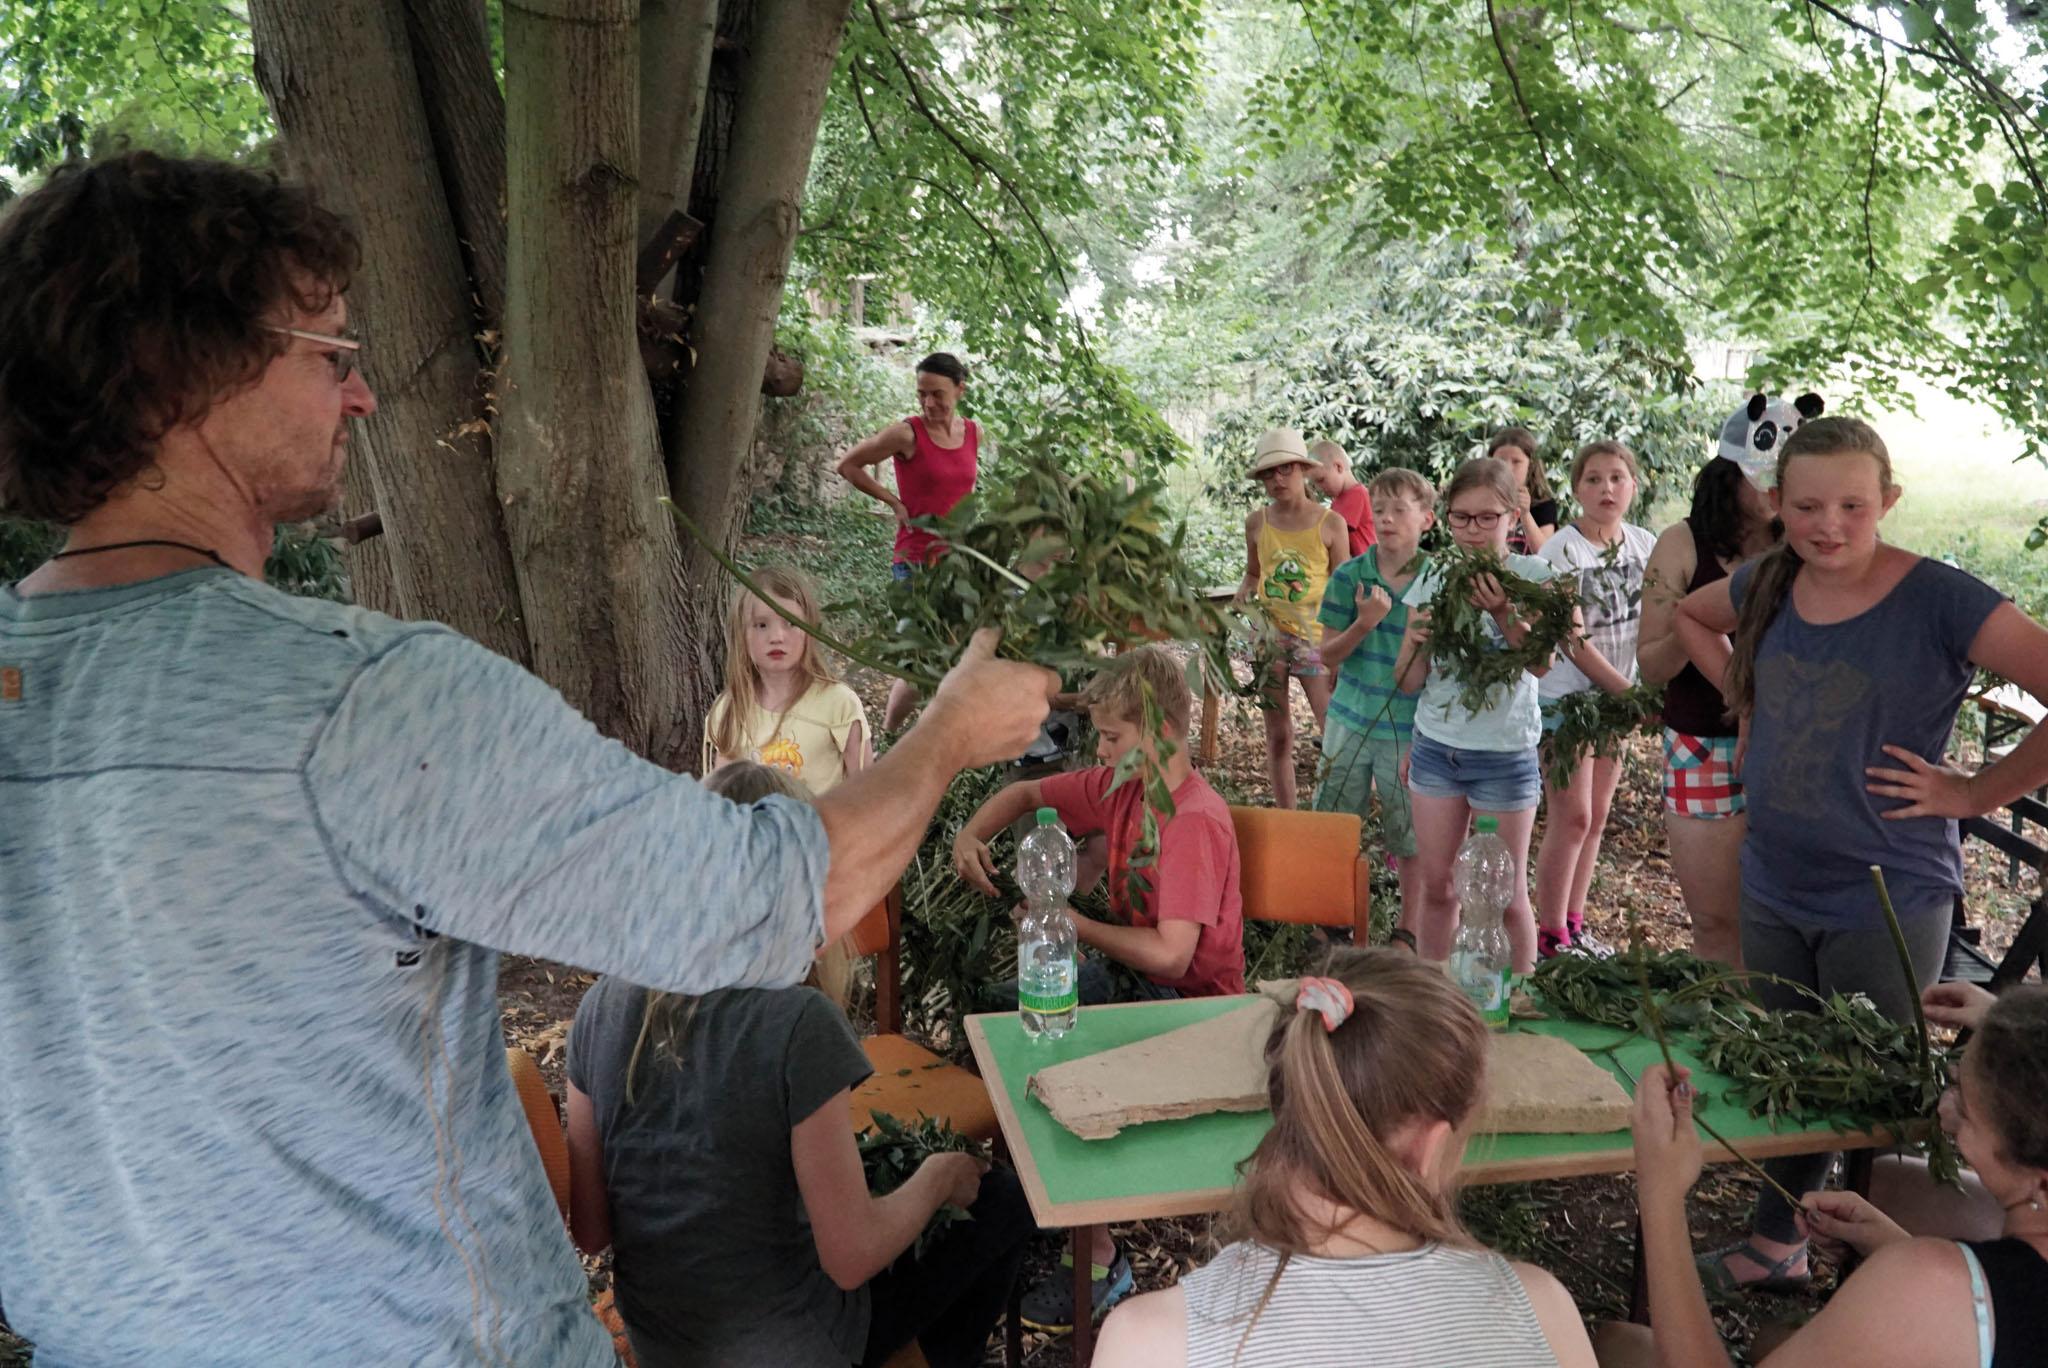 Nestbauworkshop mit Andreas Hetfeld. Foto: Matthias Schuhmann © ORLA e.V.